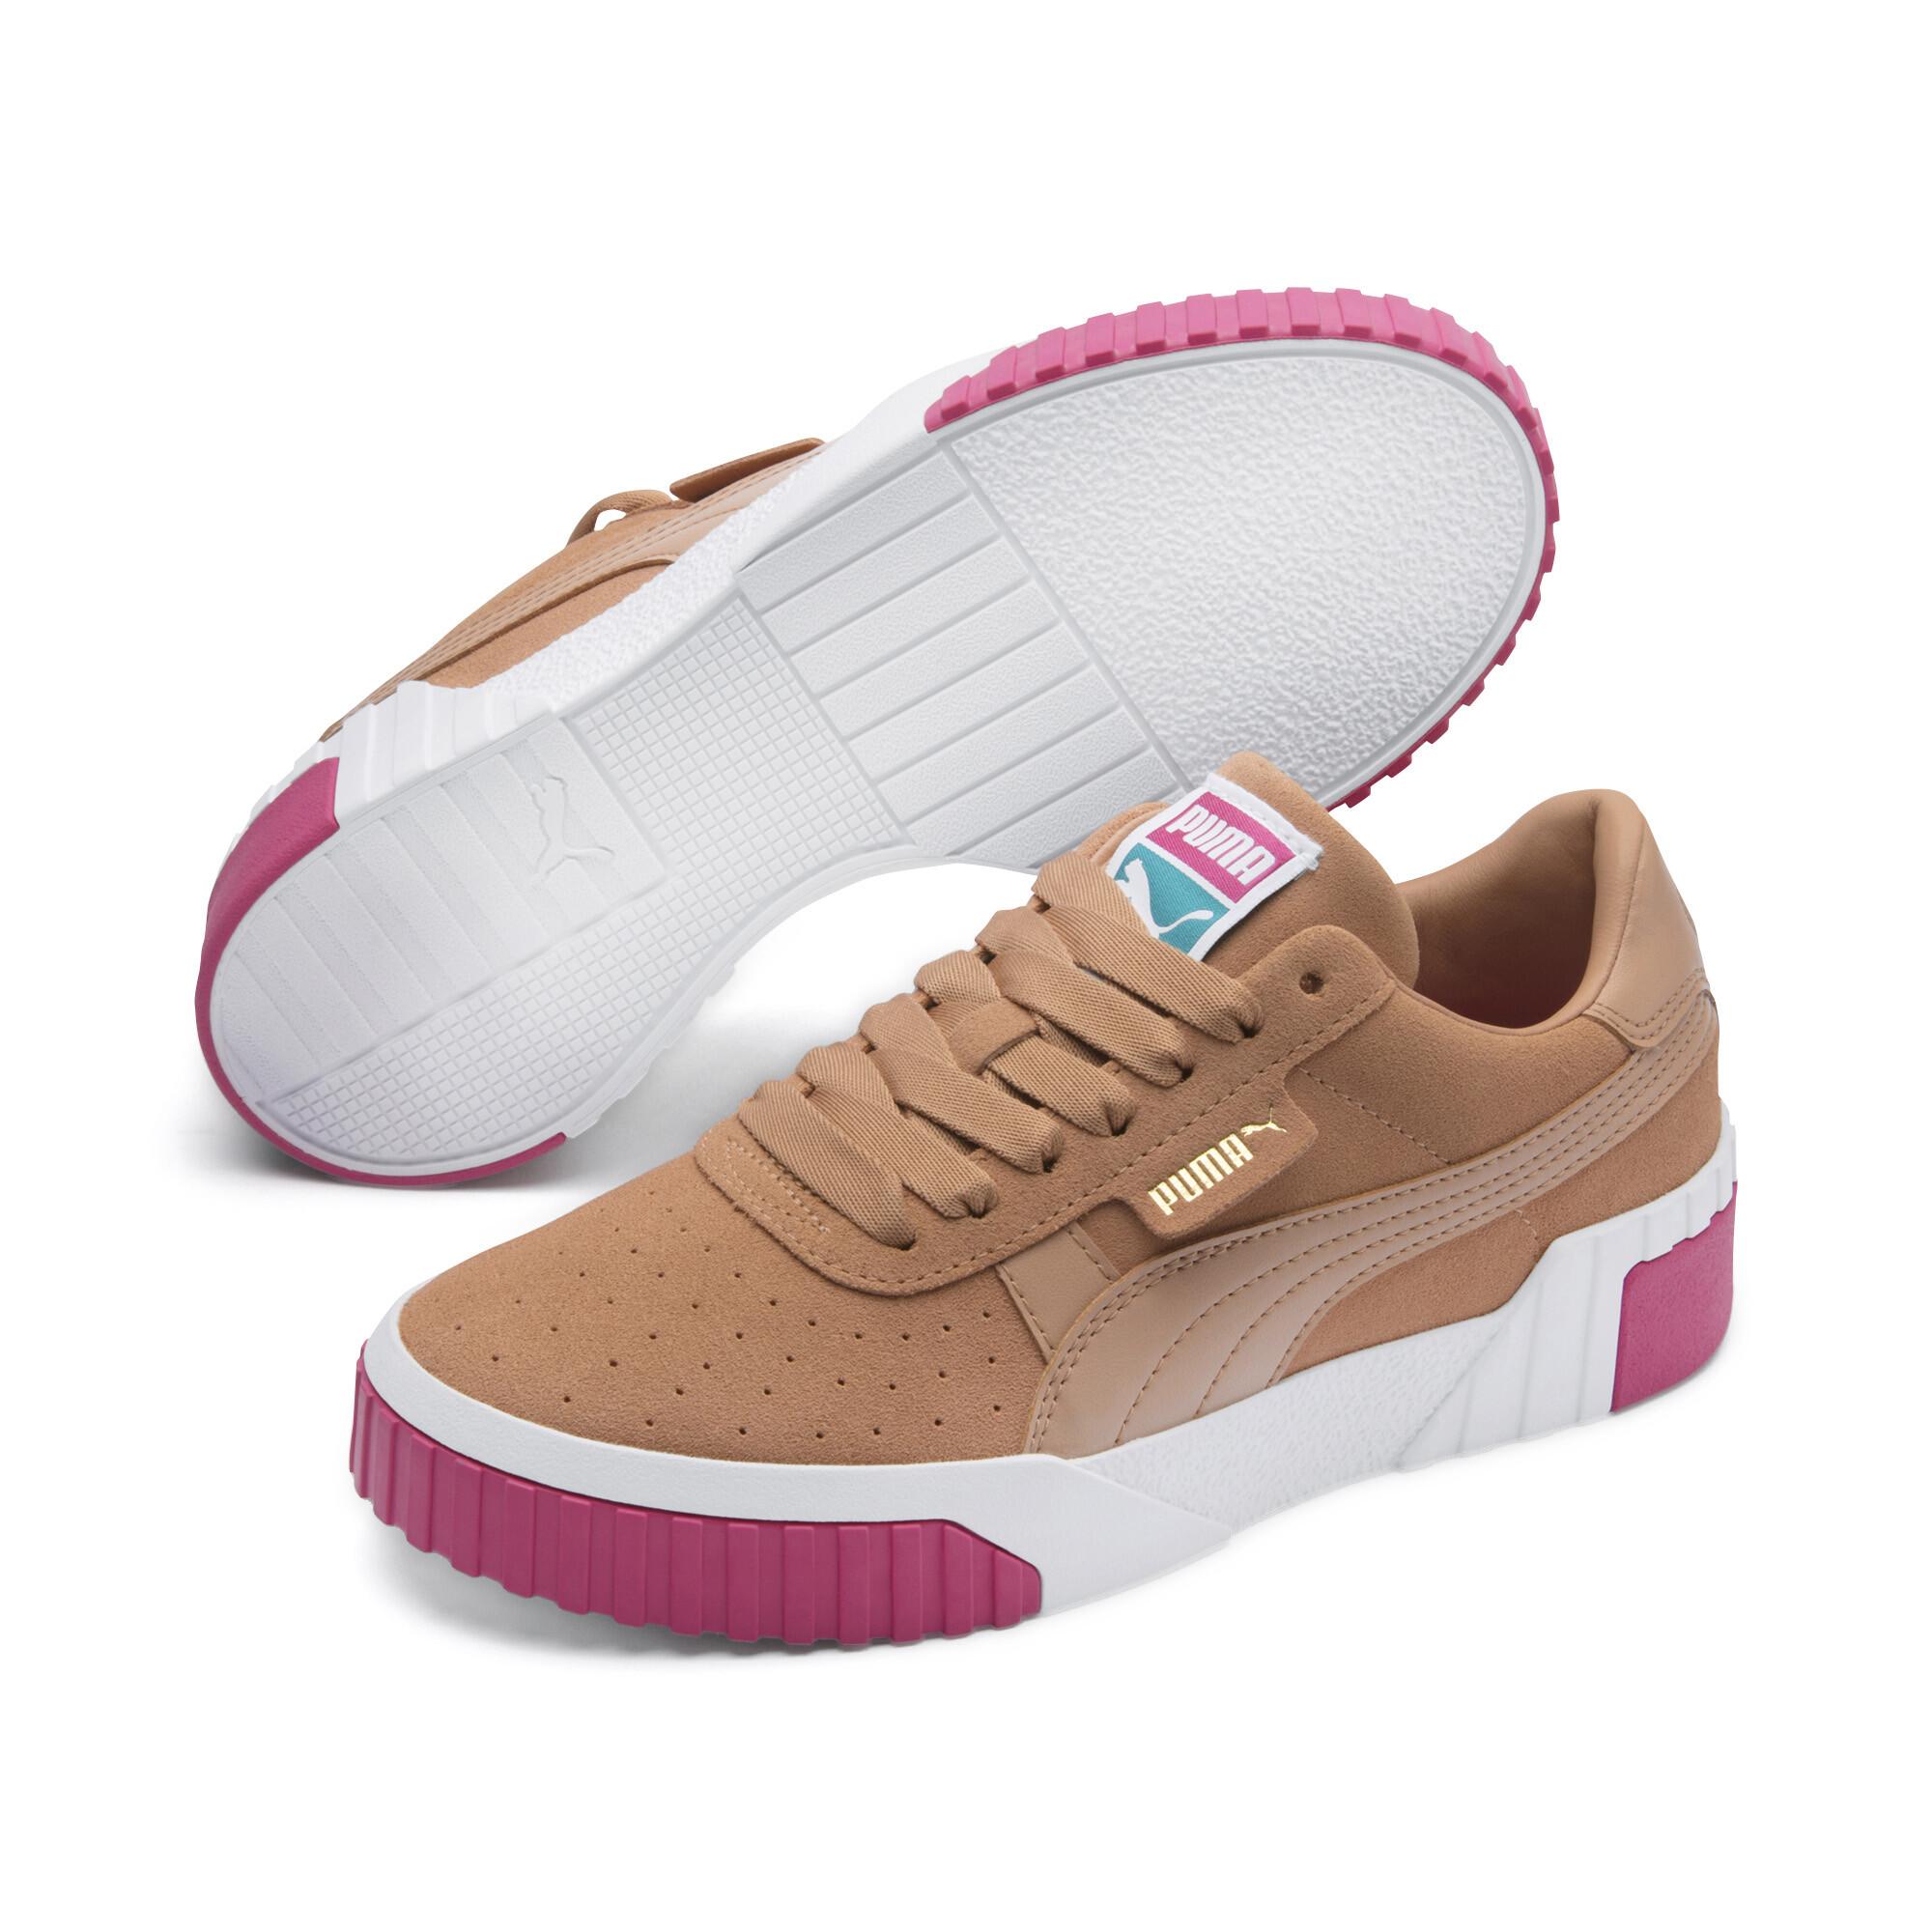 Image Puma Cali Suede Women's Sneakers #3